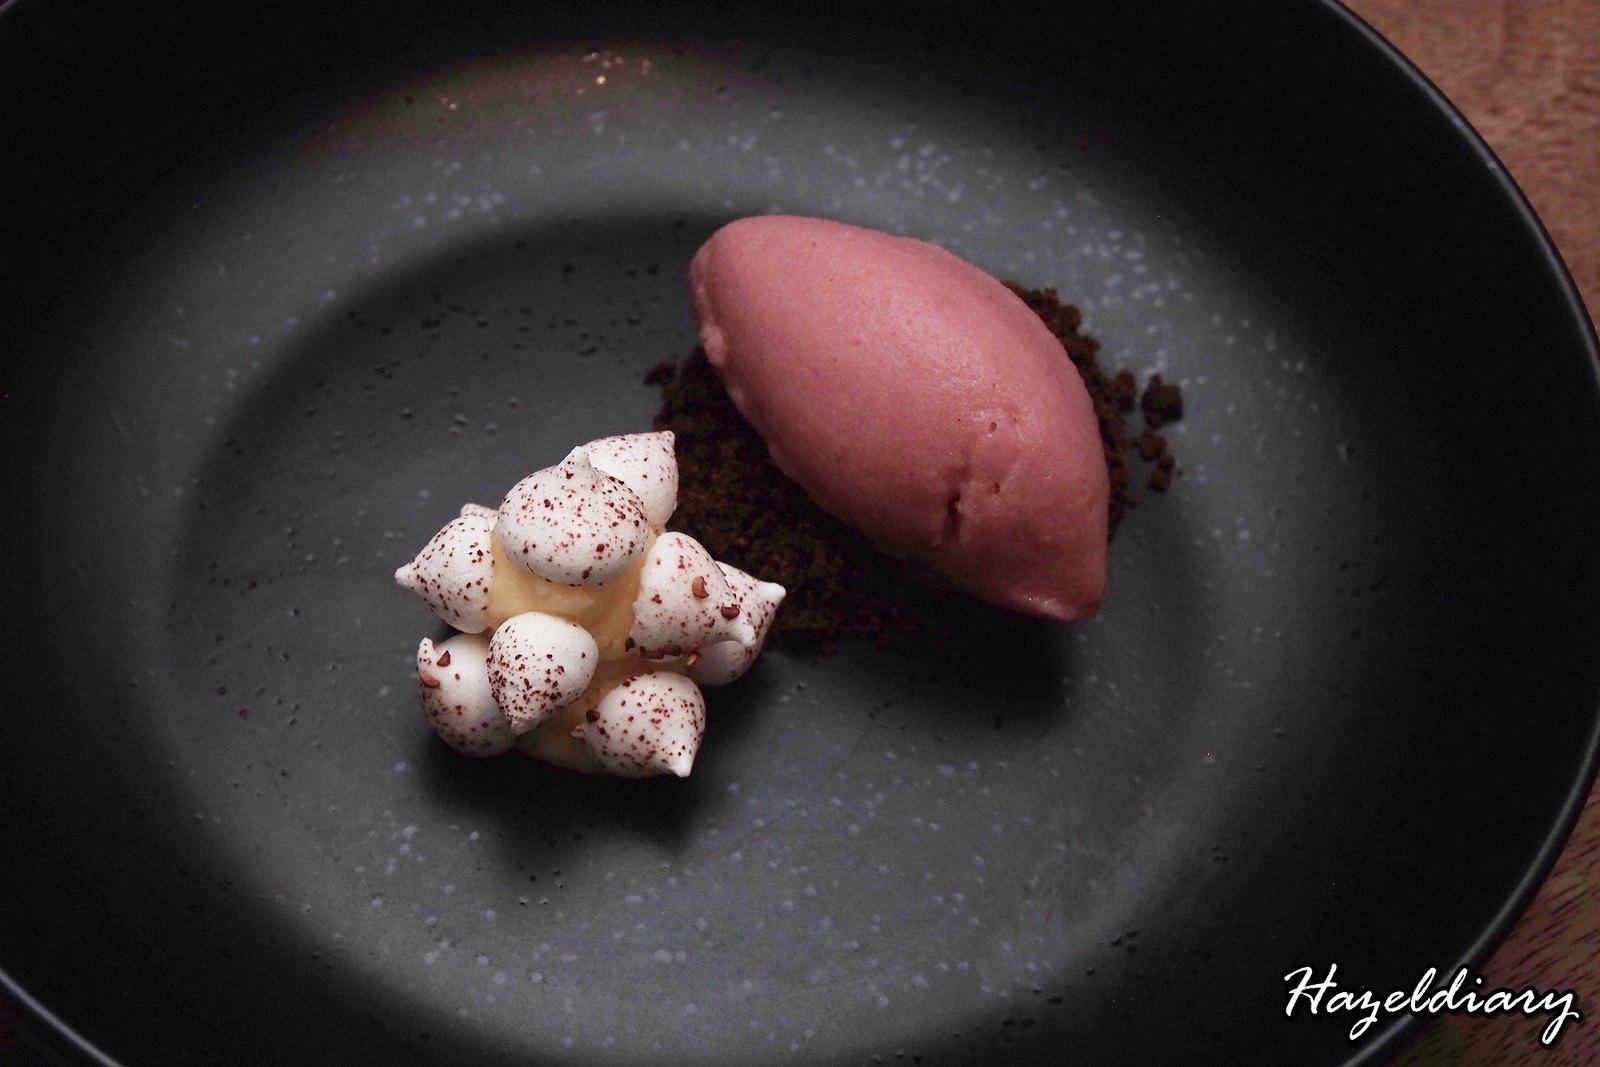 Sinfonia Ristorante-Hazeldiary-Dessert